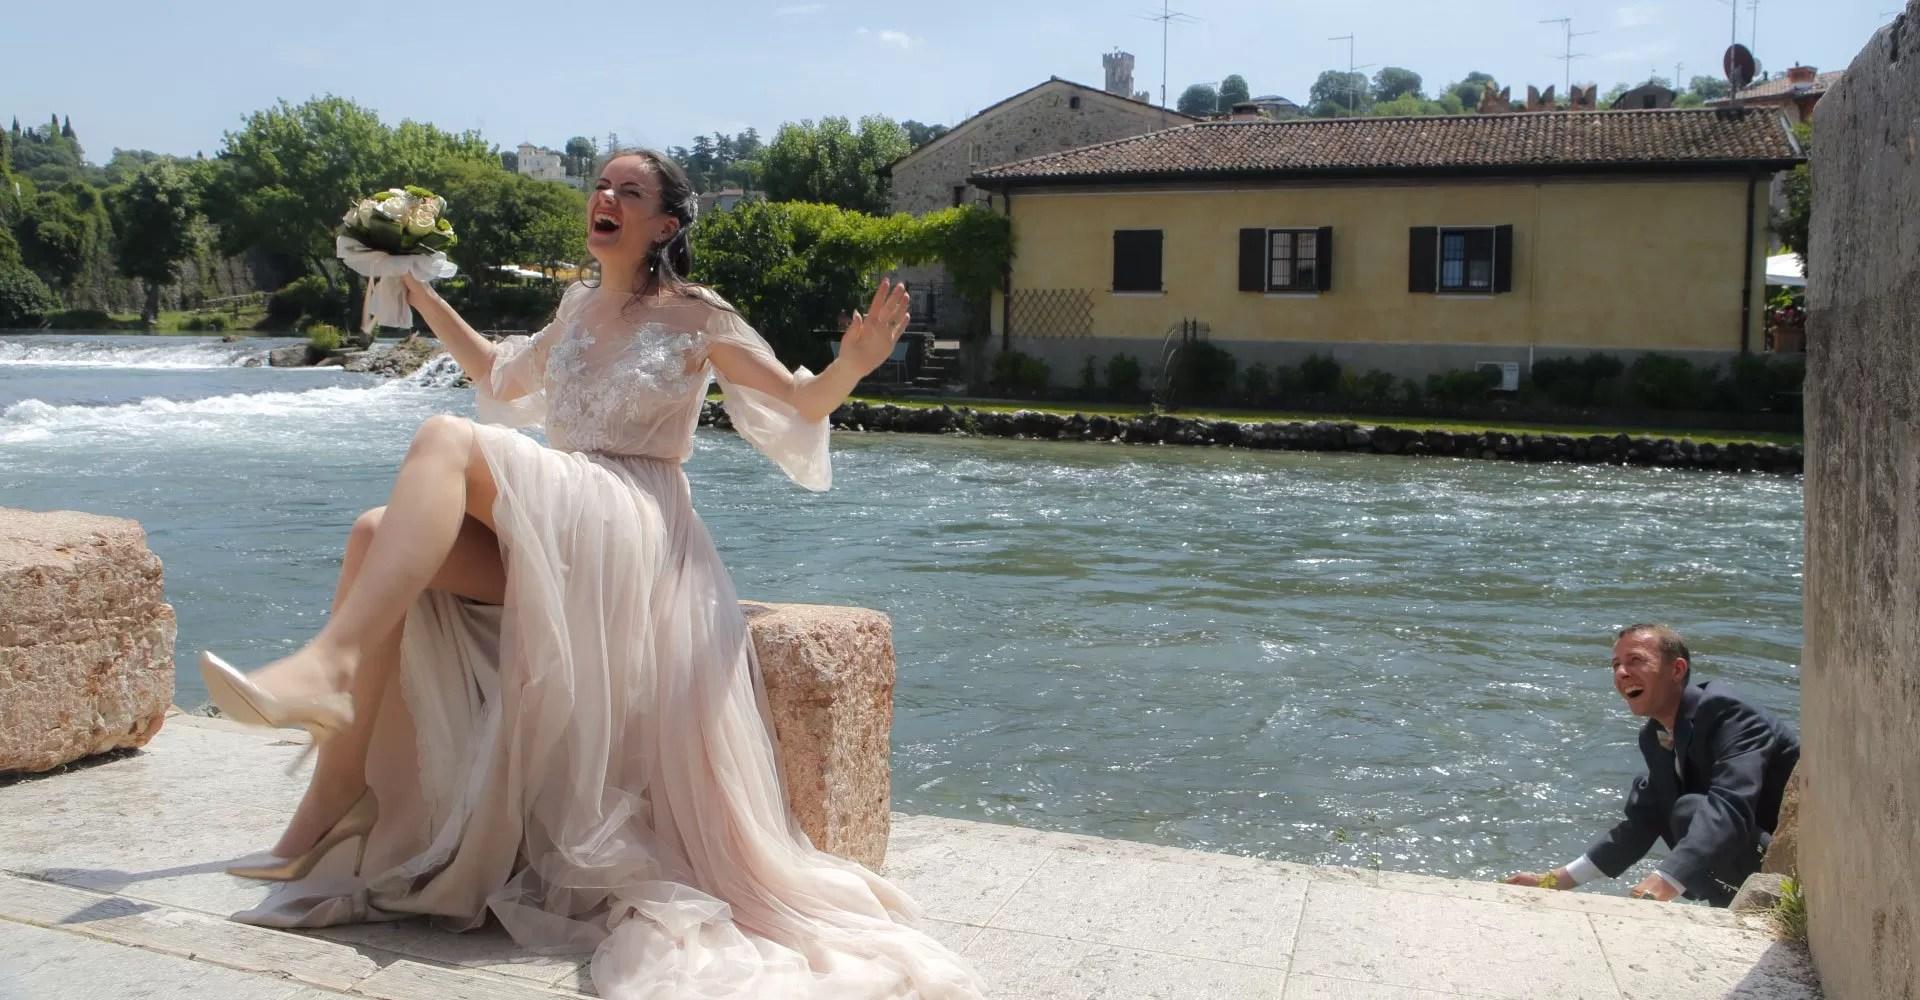 matrimoni-lago-di-garda-wedding-planner-fotografi-desenzano-del-garda-peschiera-del garda-federici-marco-fotografo-marin-diana